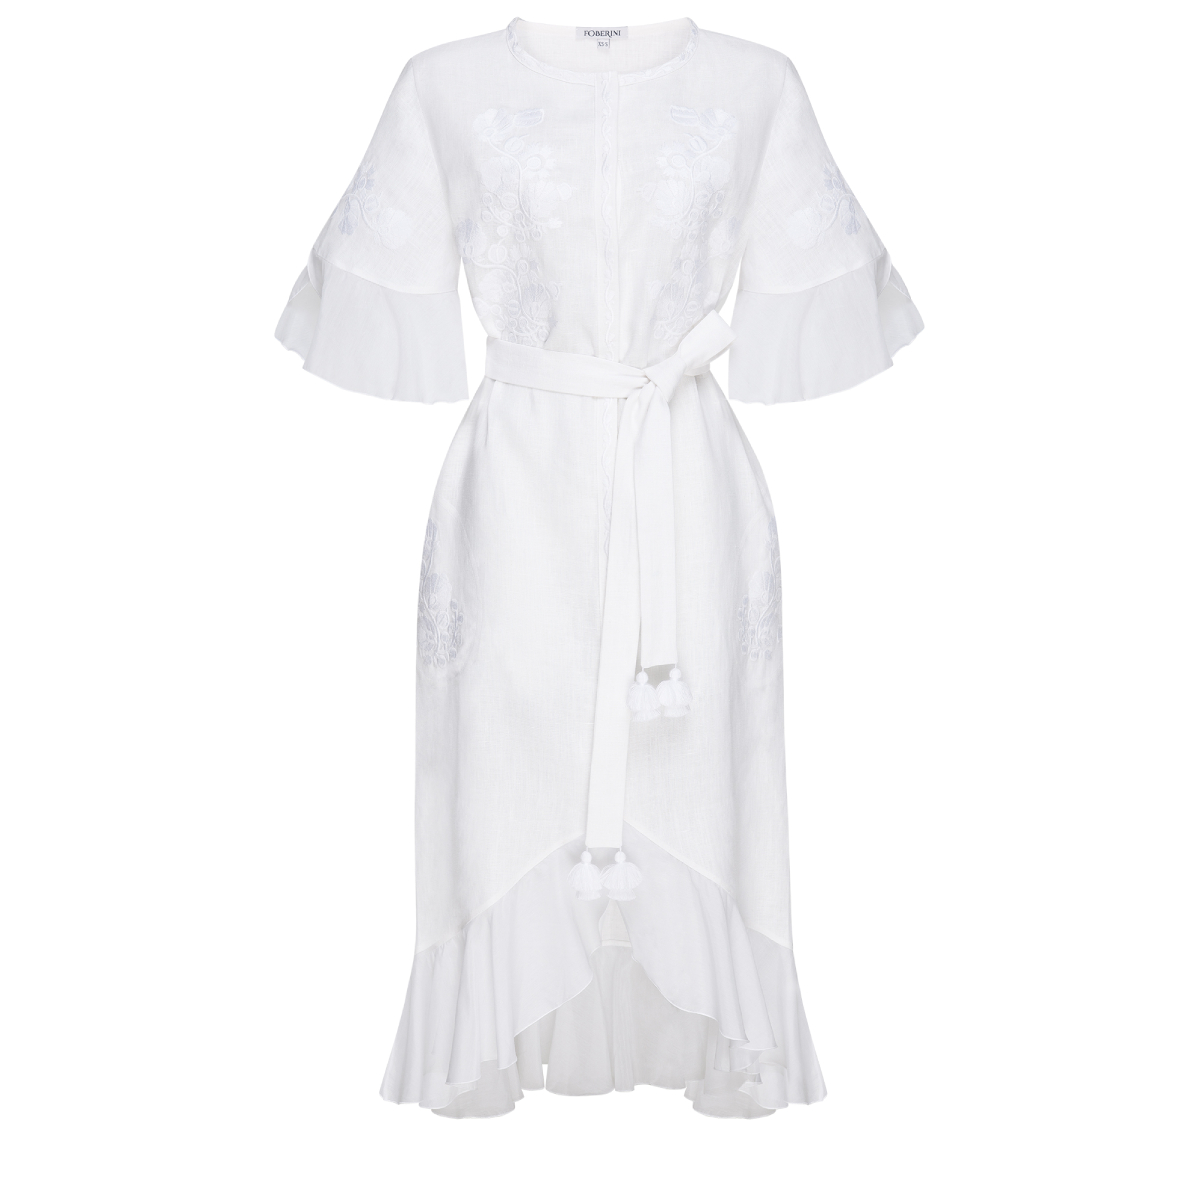 Daisy White Midi-dress